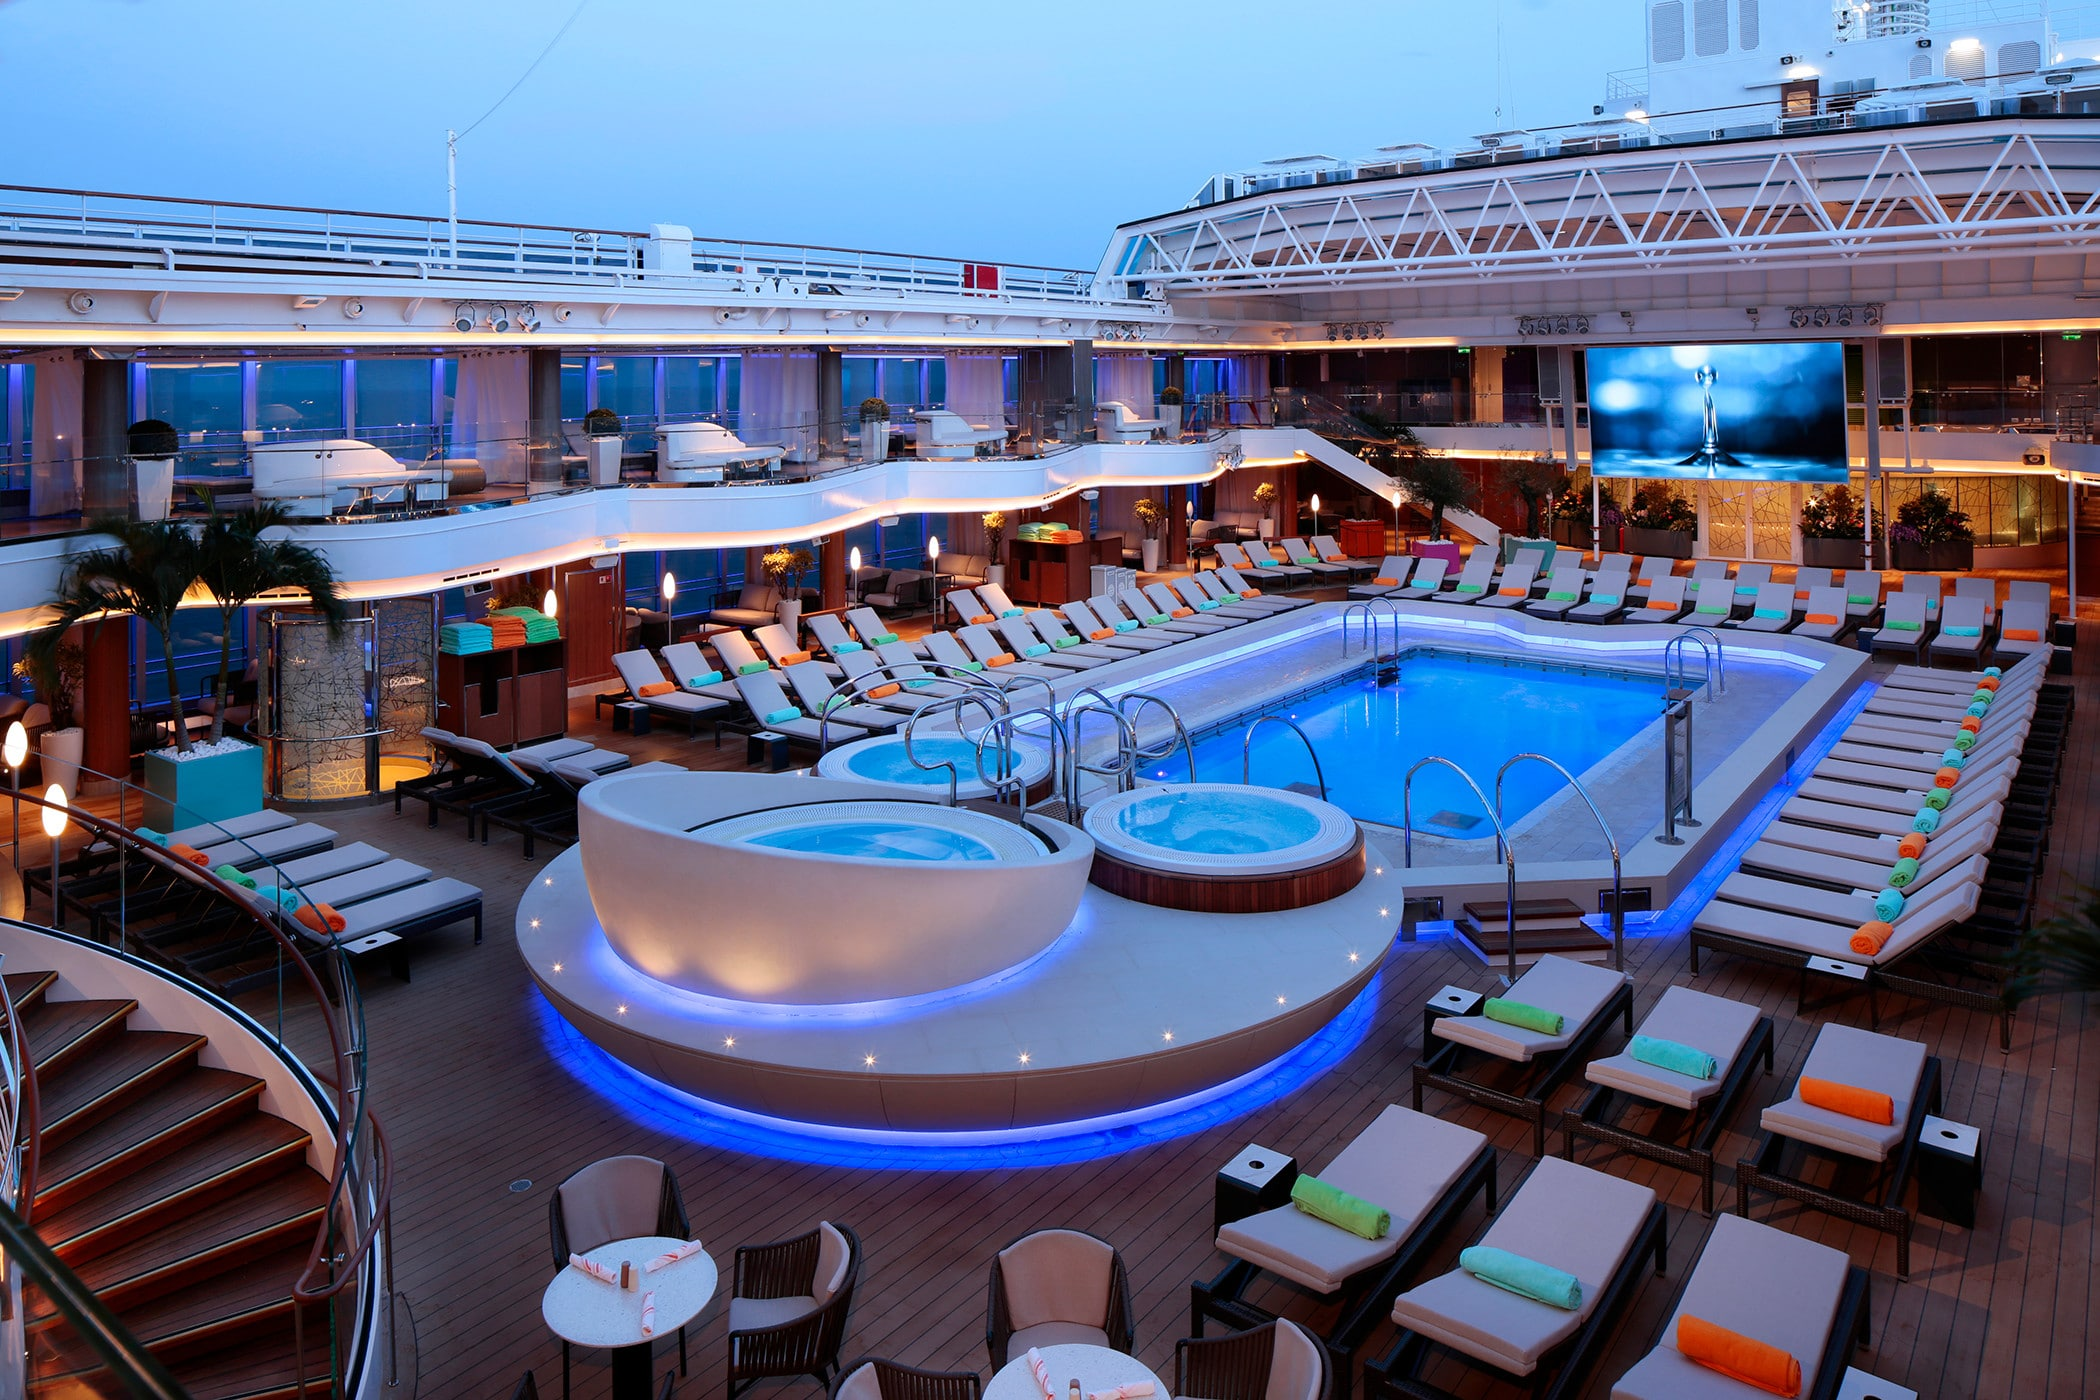 cruiseschip - Holland America Line - Nieuw Statendam - Lido Pool